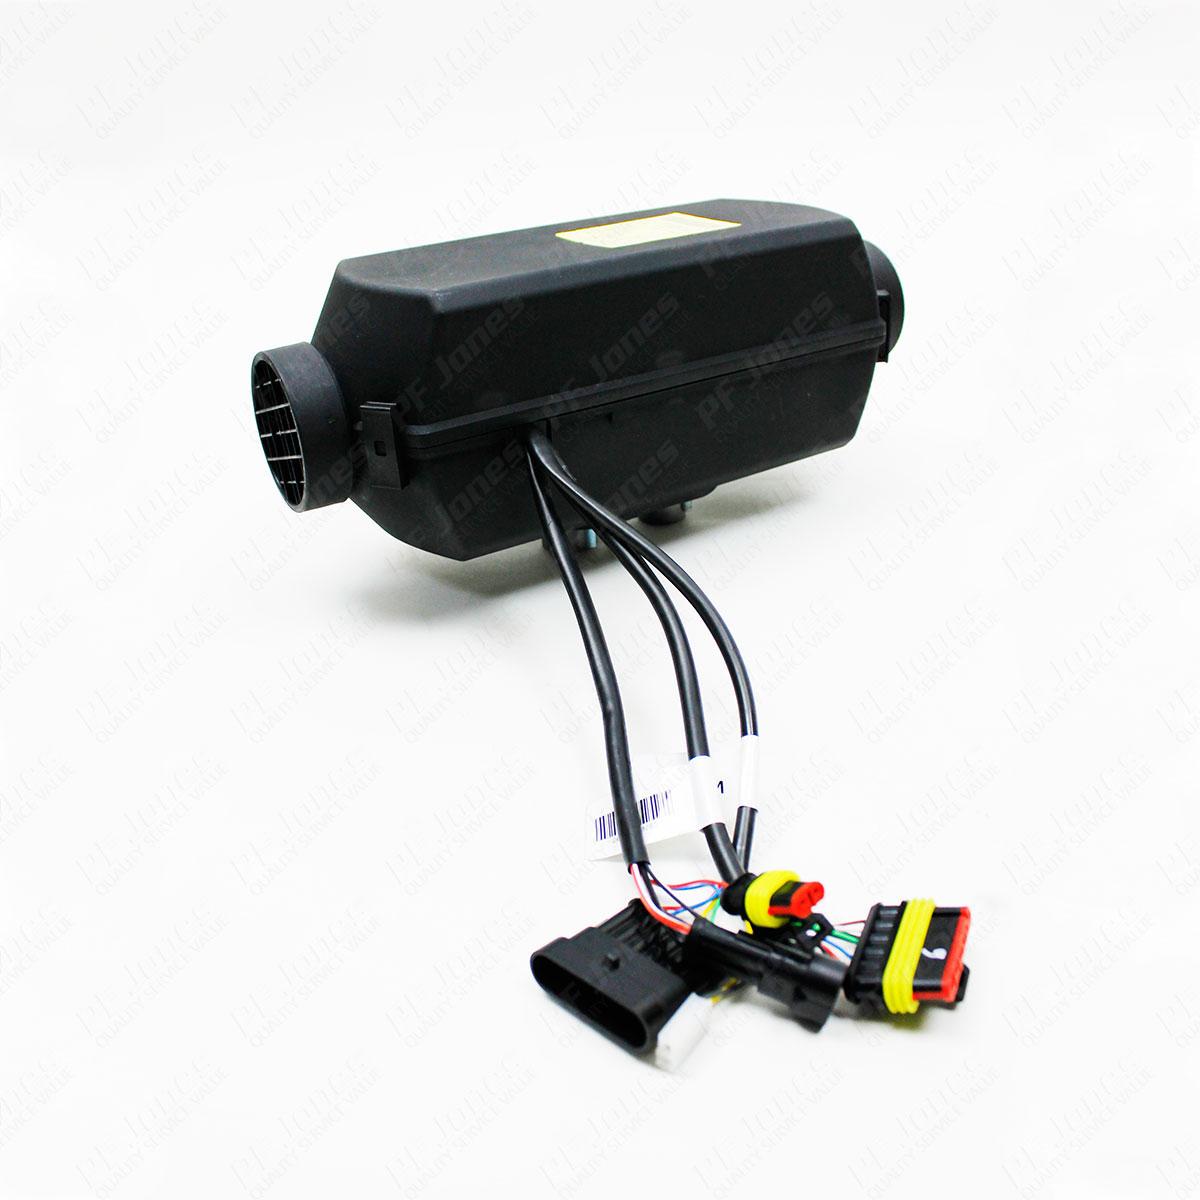 Planar 2D-12-TM Air Heater 2kW/ 12V - Volkwagen T5/T6 Kit